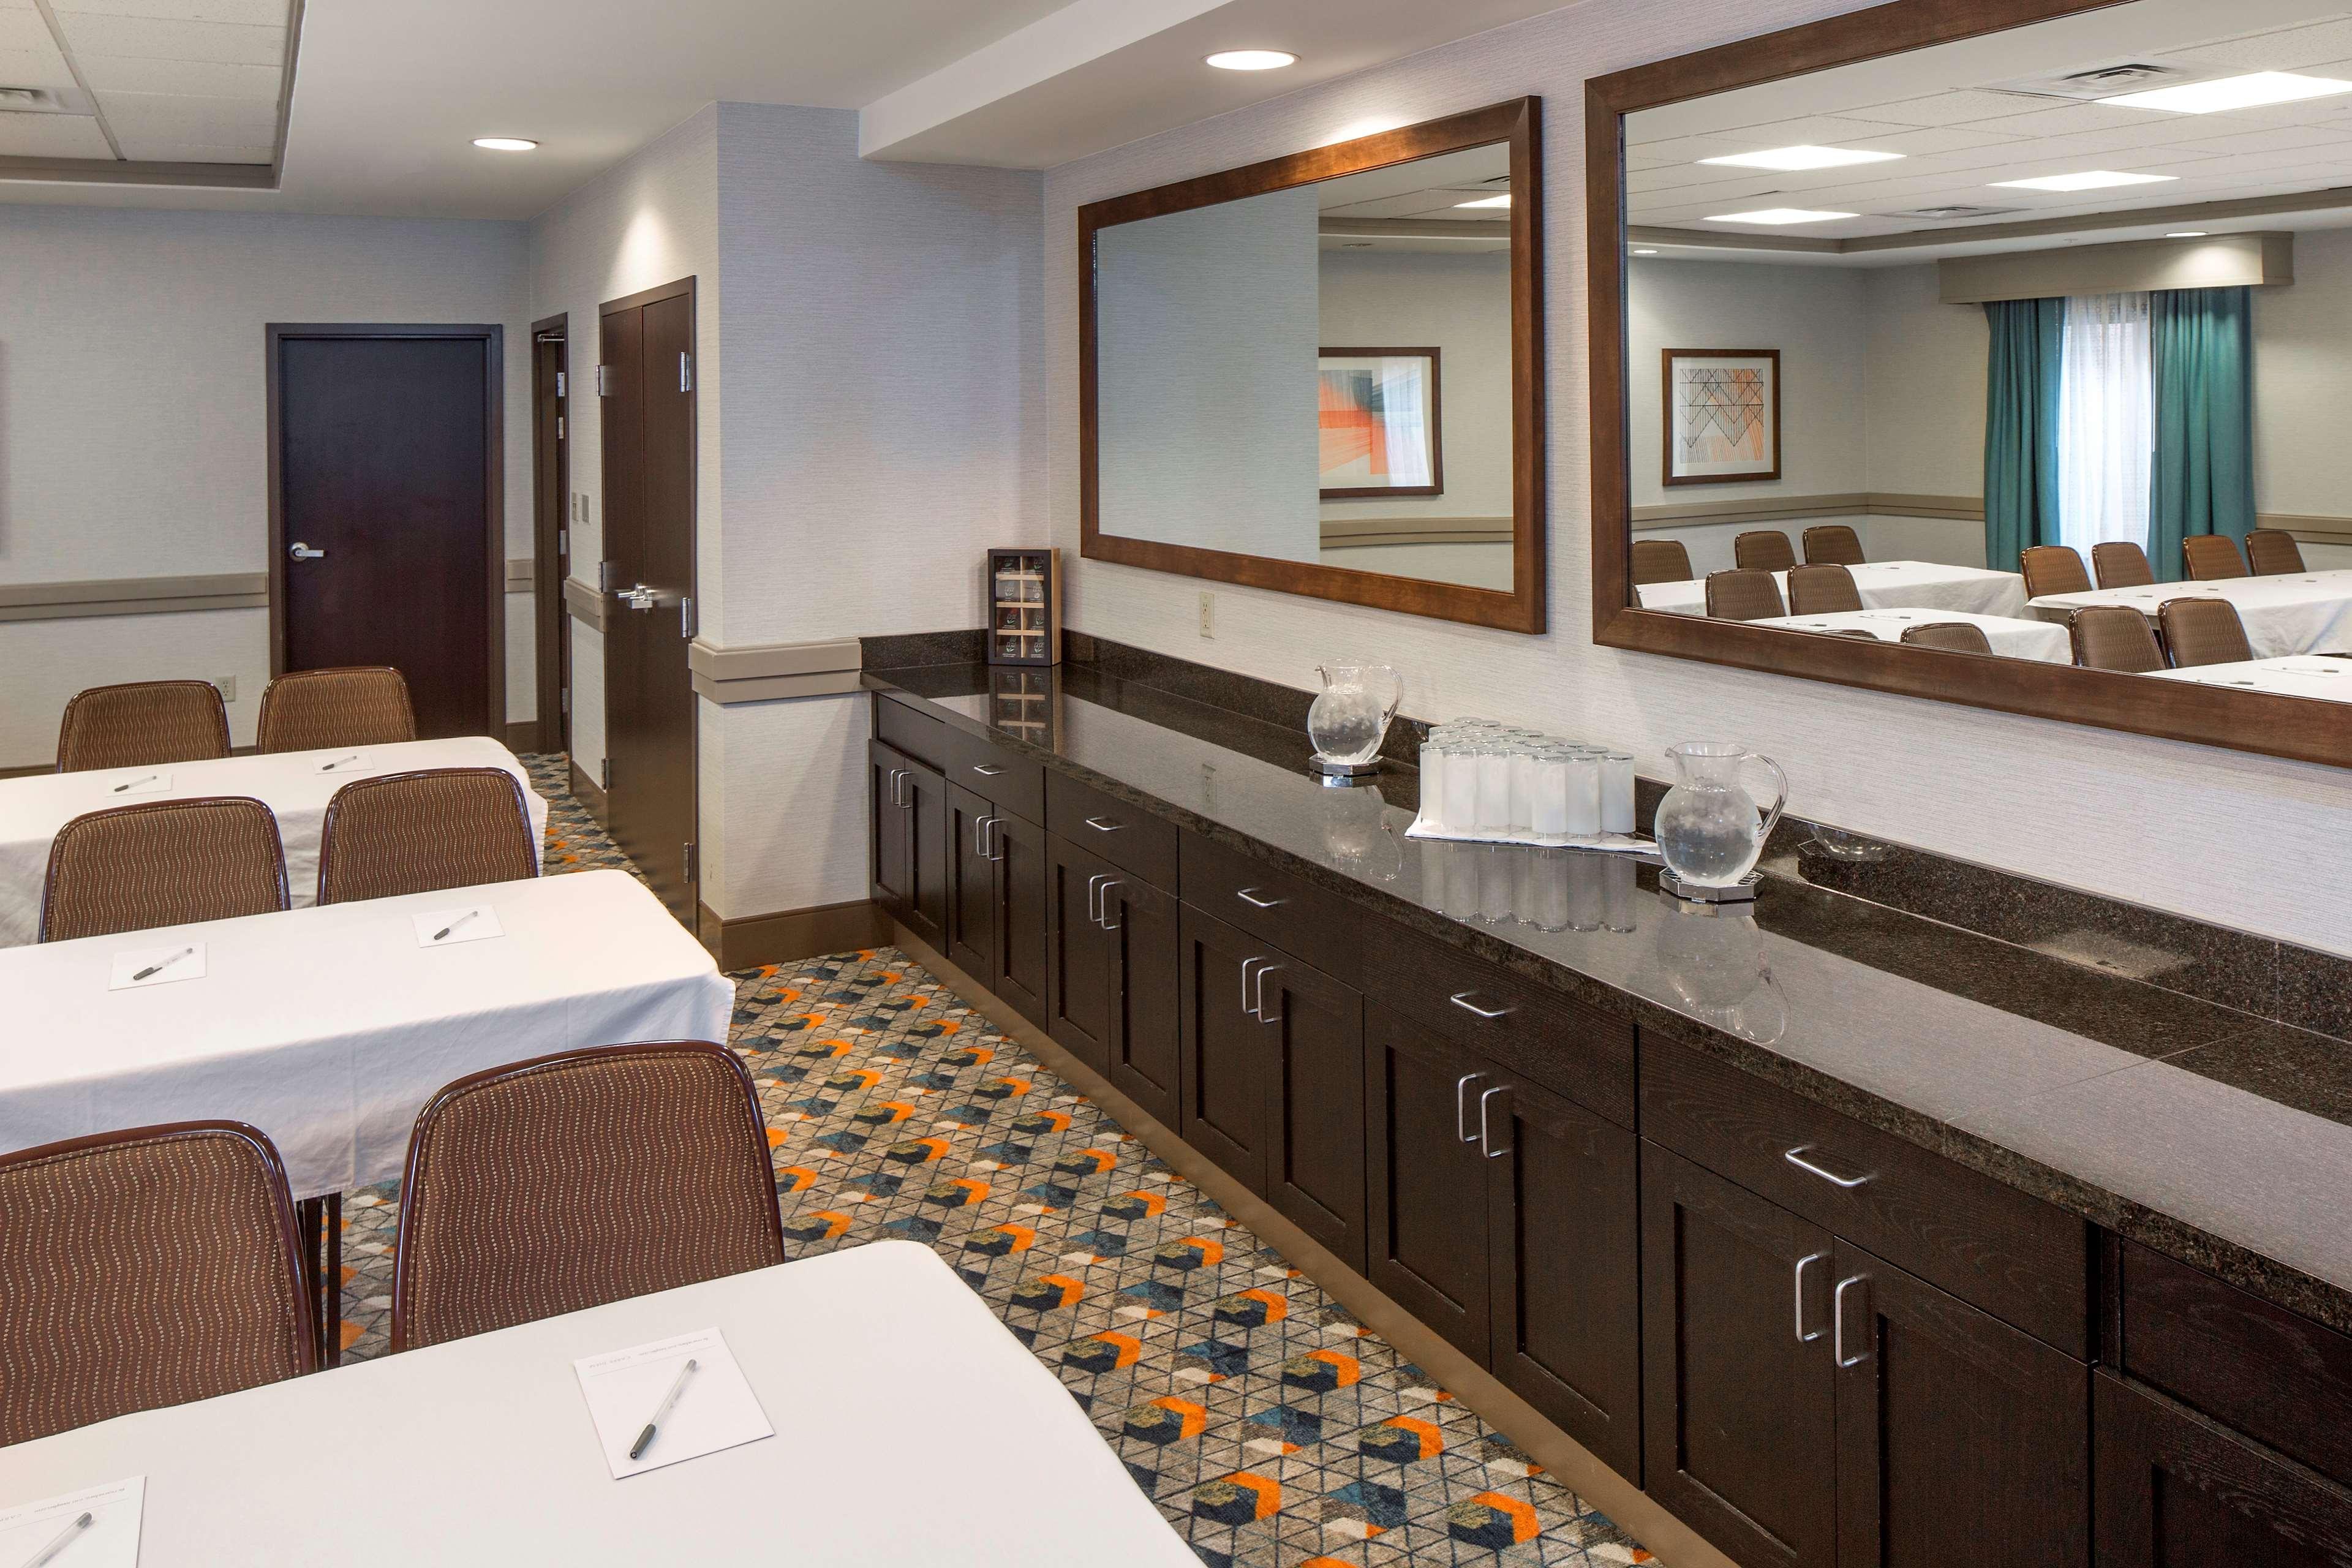 Hampton Inn & Suites Spokane Valley image 36